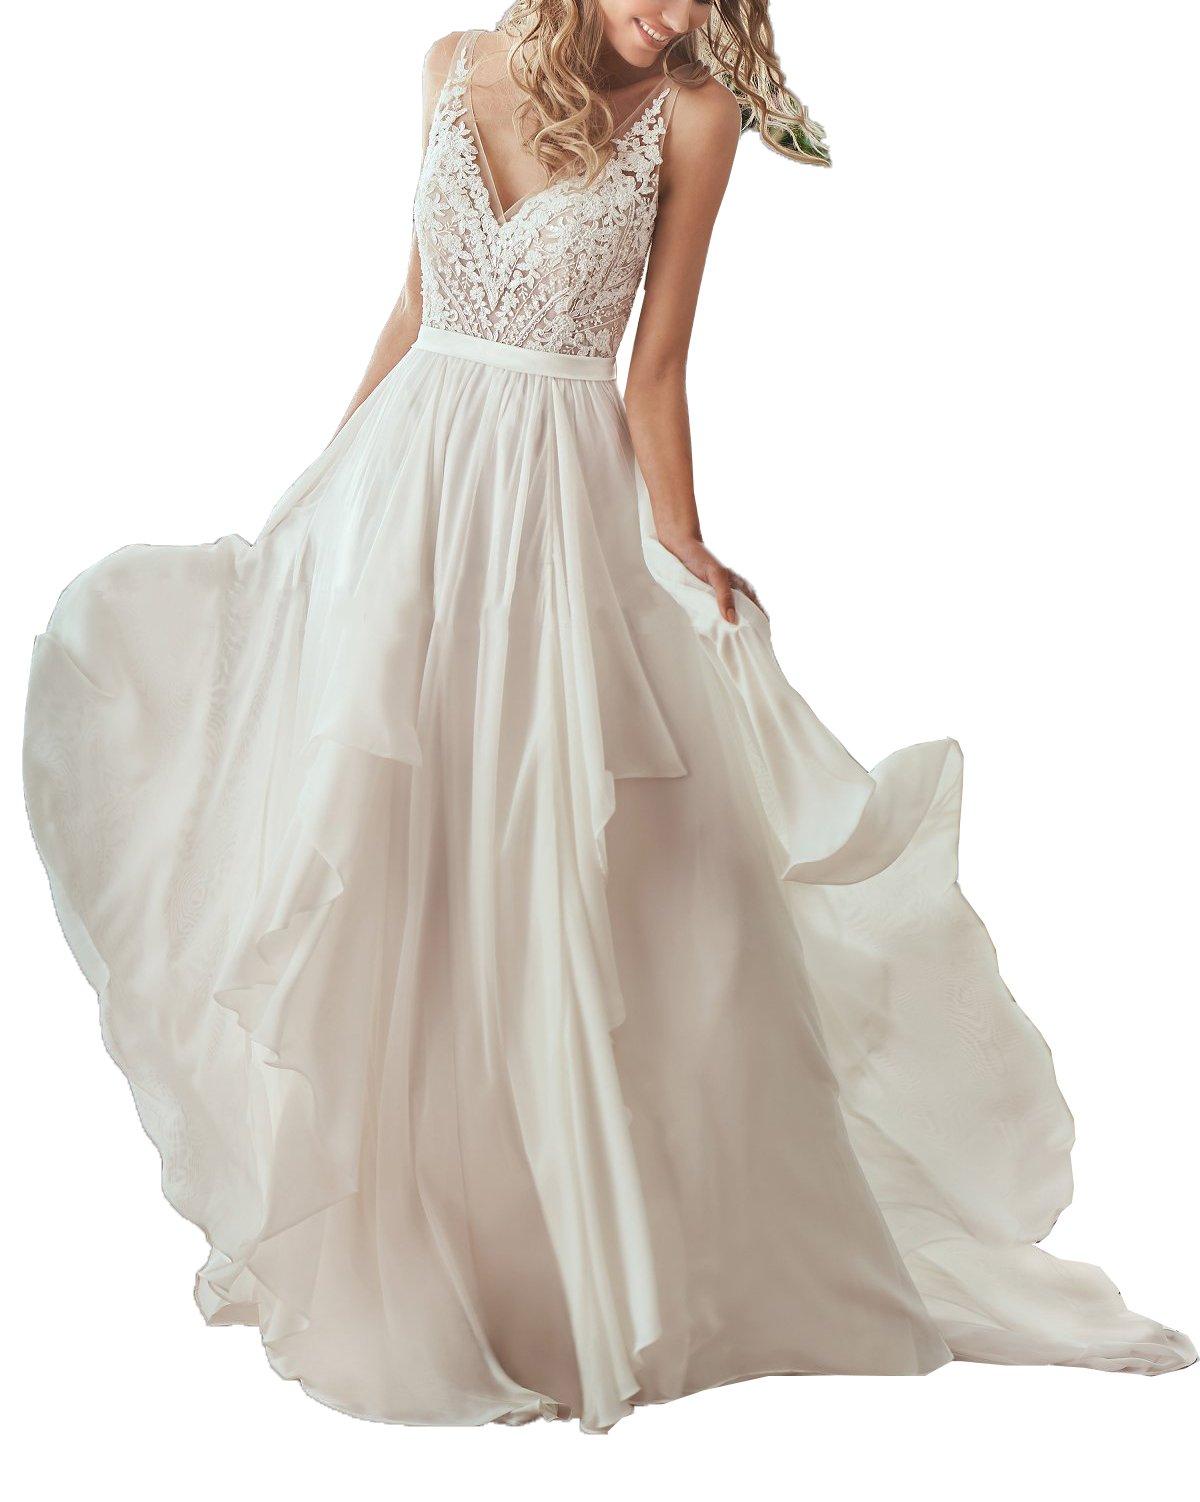 Nicefashion Women's Vintage V Back Sweep Train Bohemian Chiffon Beach Wedding Formal Gowns White US8